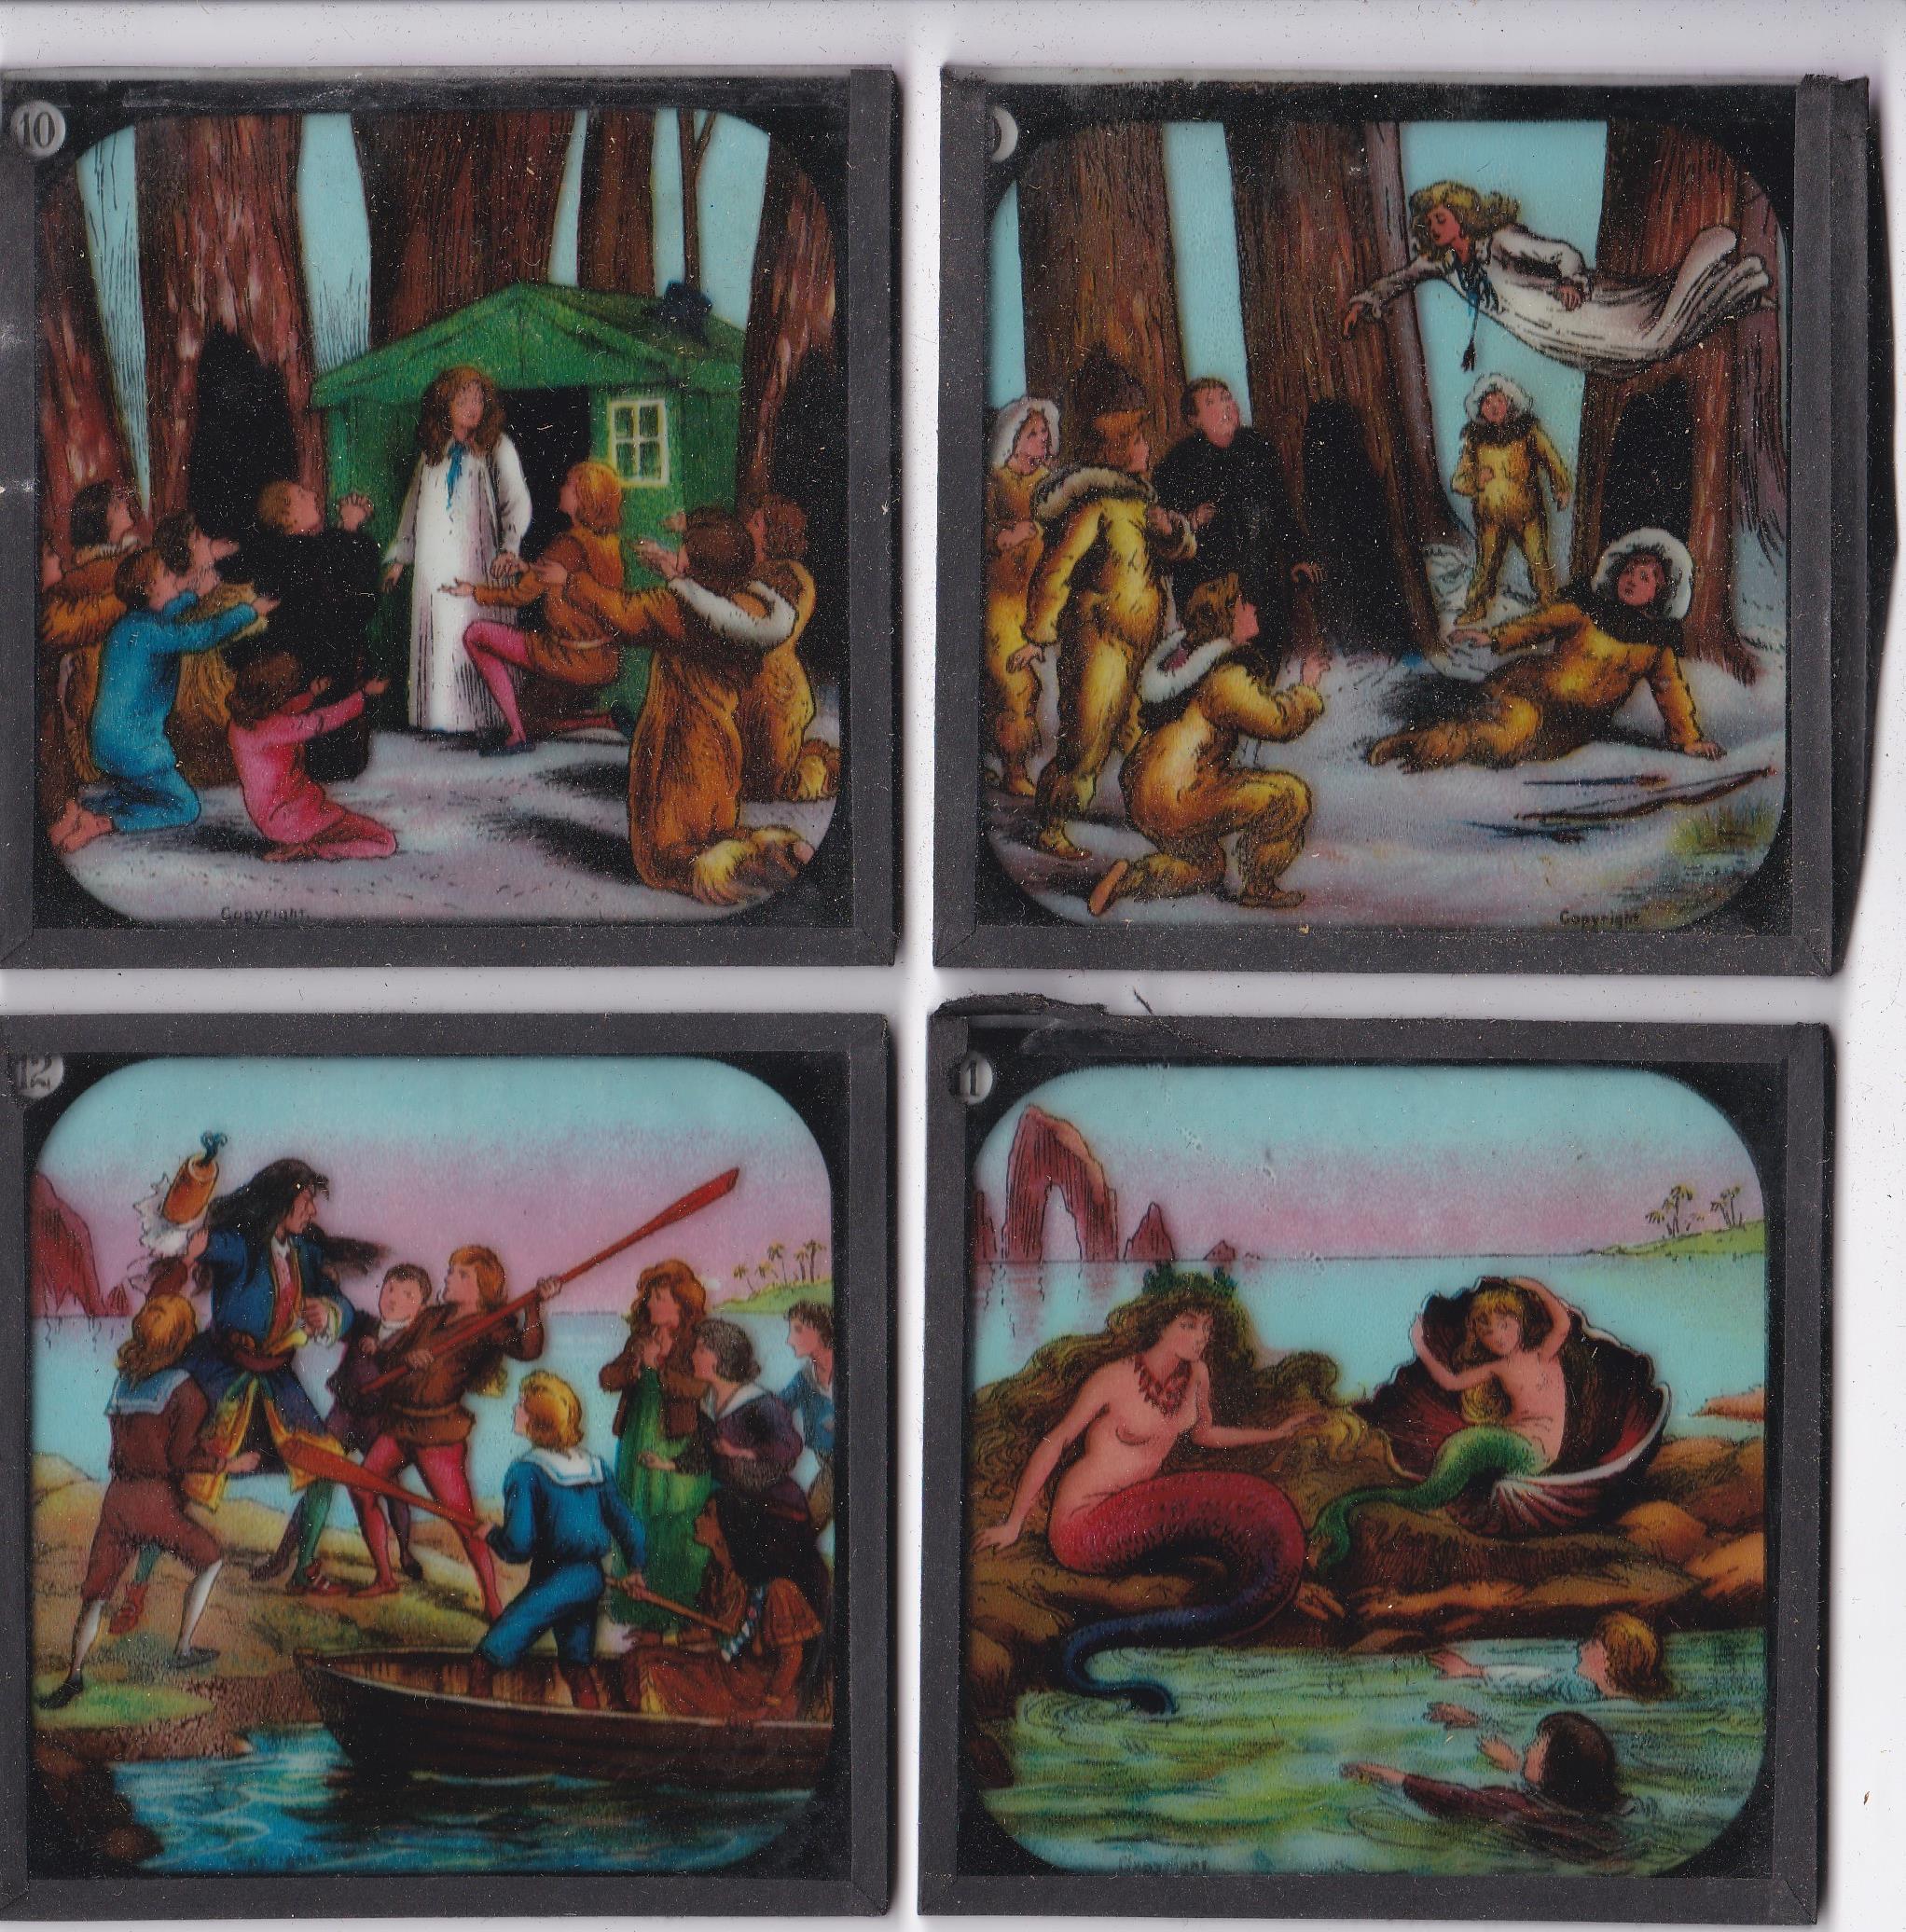 Peter Pan Magic Lantern Coloured slides, Primus Junior Lecturers series Peter Pan Magic Lantern - Image 2 of 4